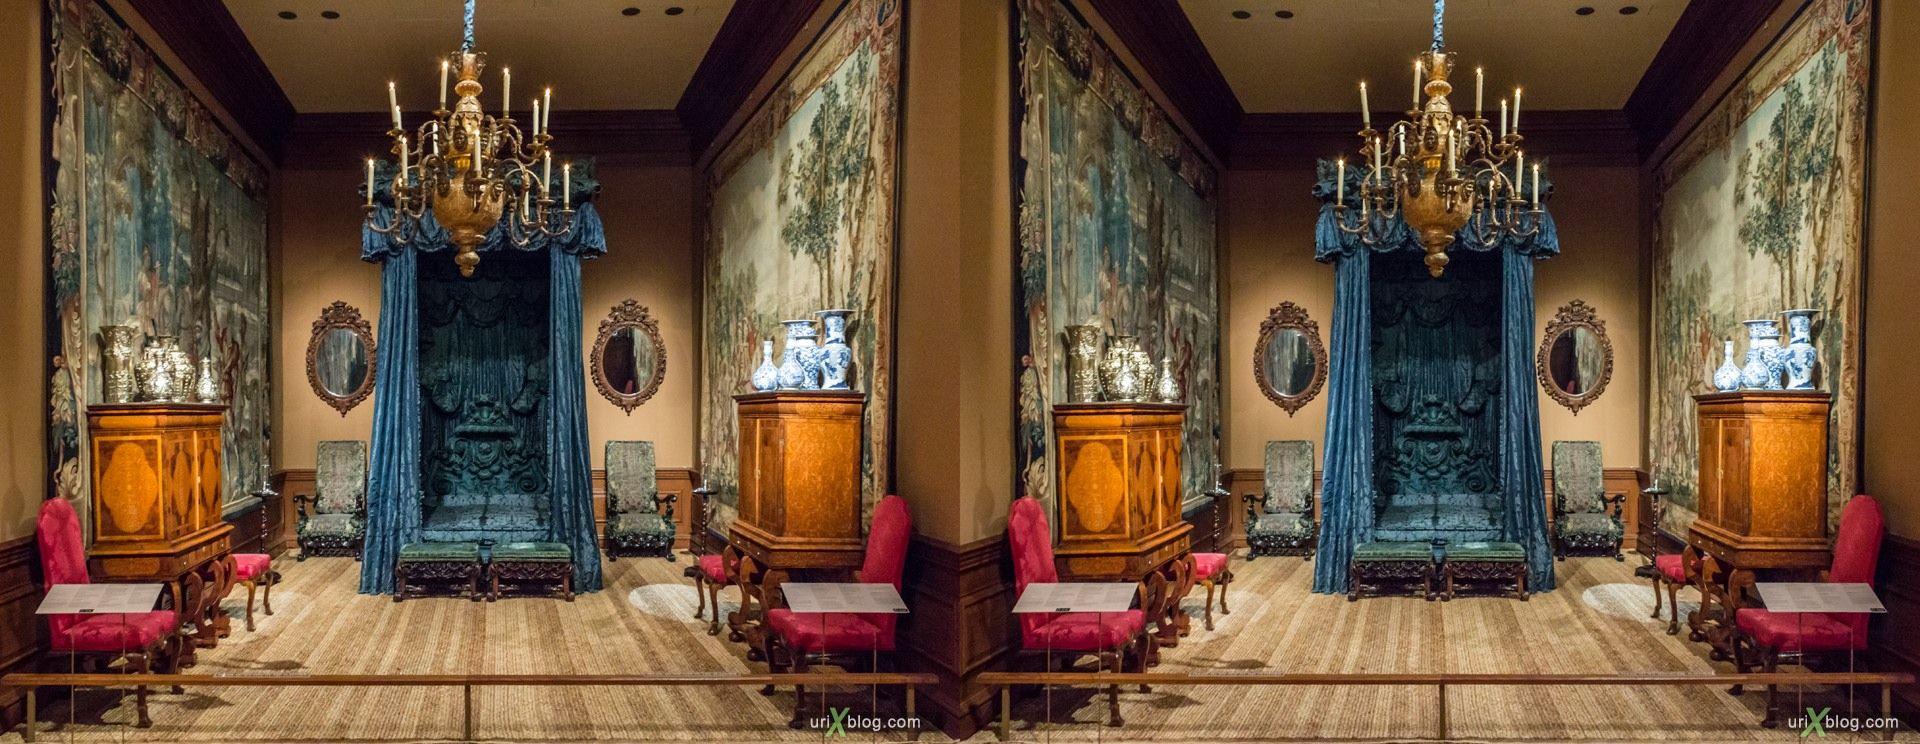 The Metropolitan Museum of Art, NYC, USA, 2013.04.09